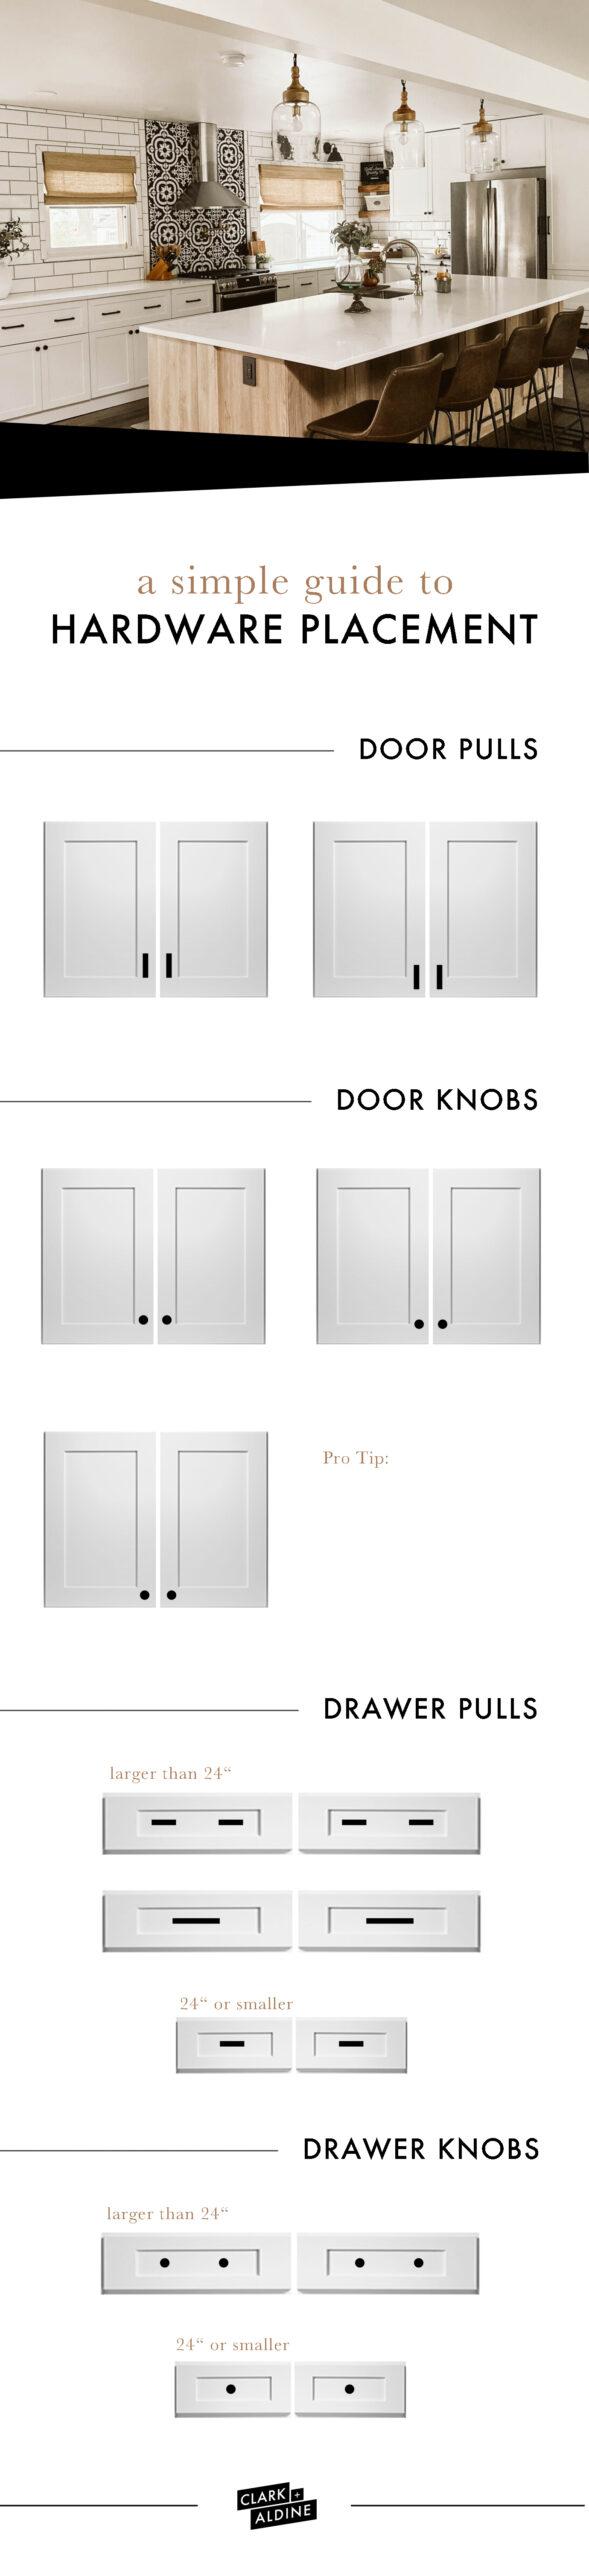 Cabinet Hardware Placement Guide Clark Aldine